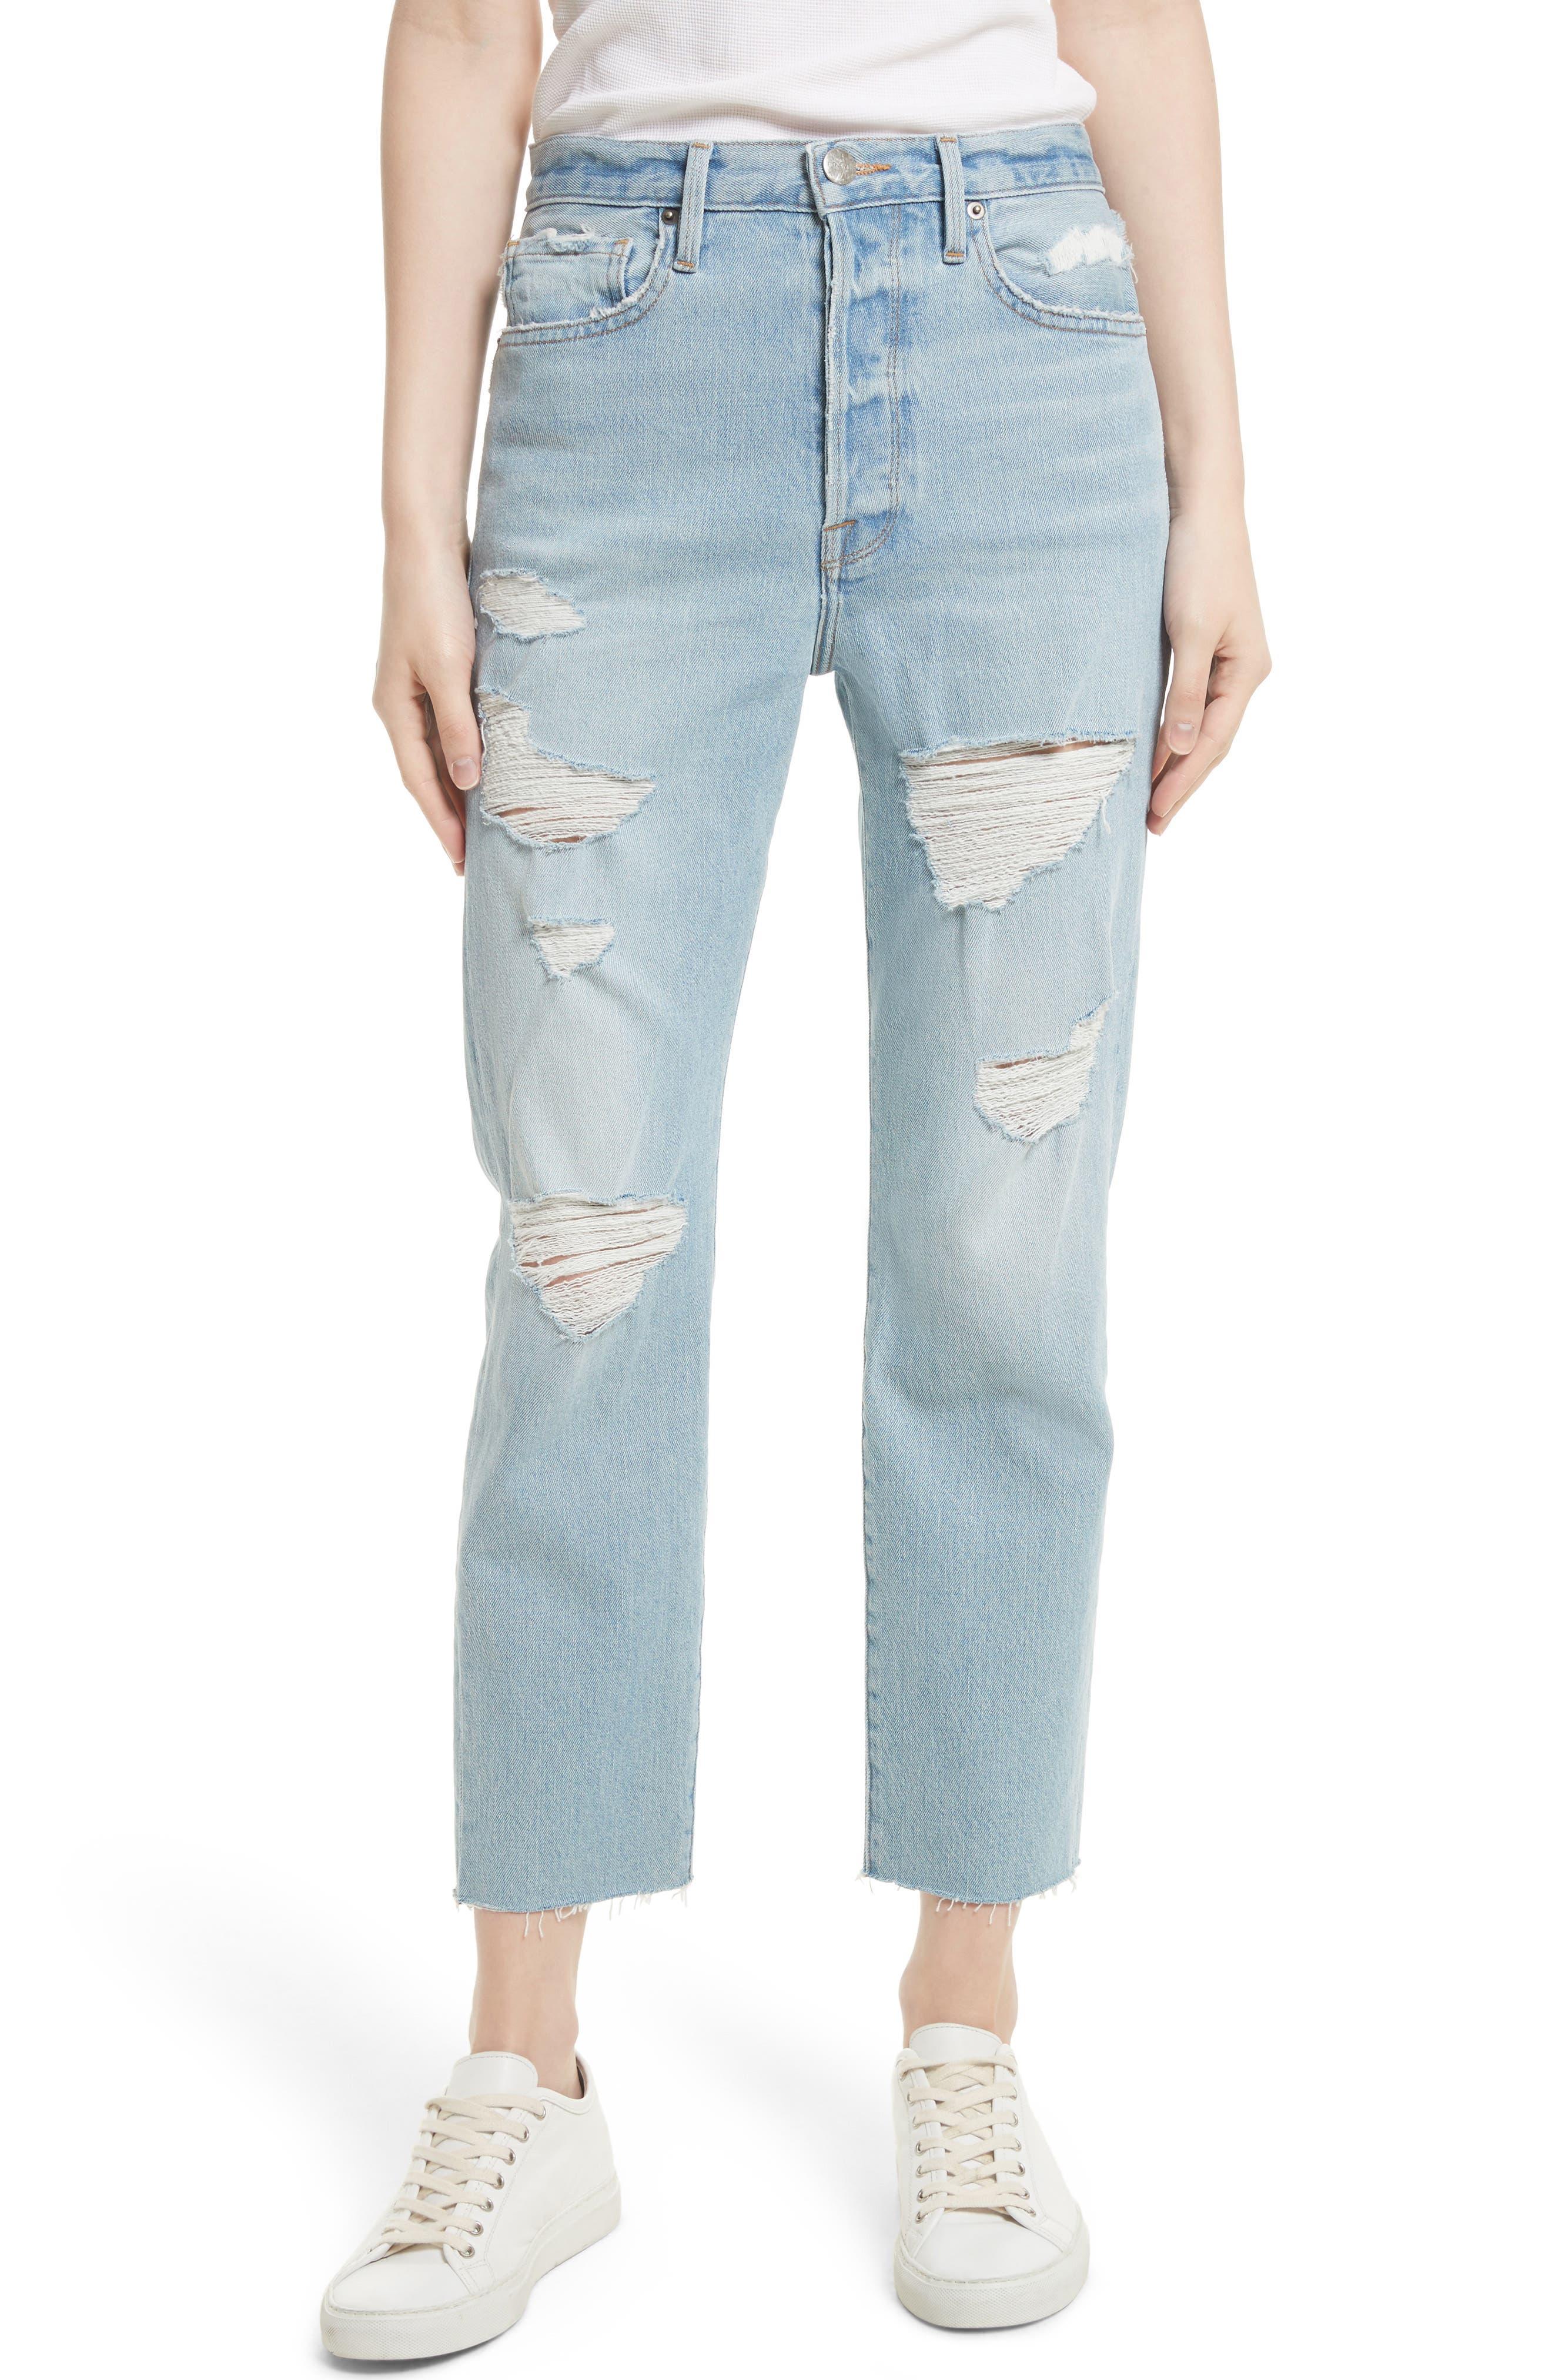 Alternate Image 1 Selected - FRAME Le Original Raw Edge High Waist Jeans (Harrah)